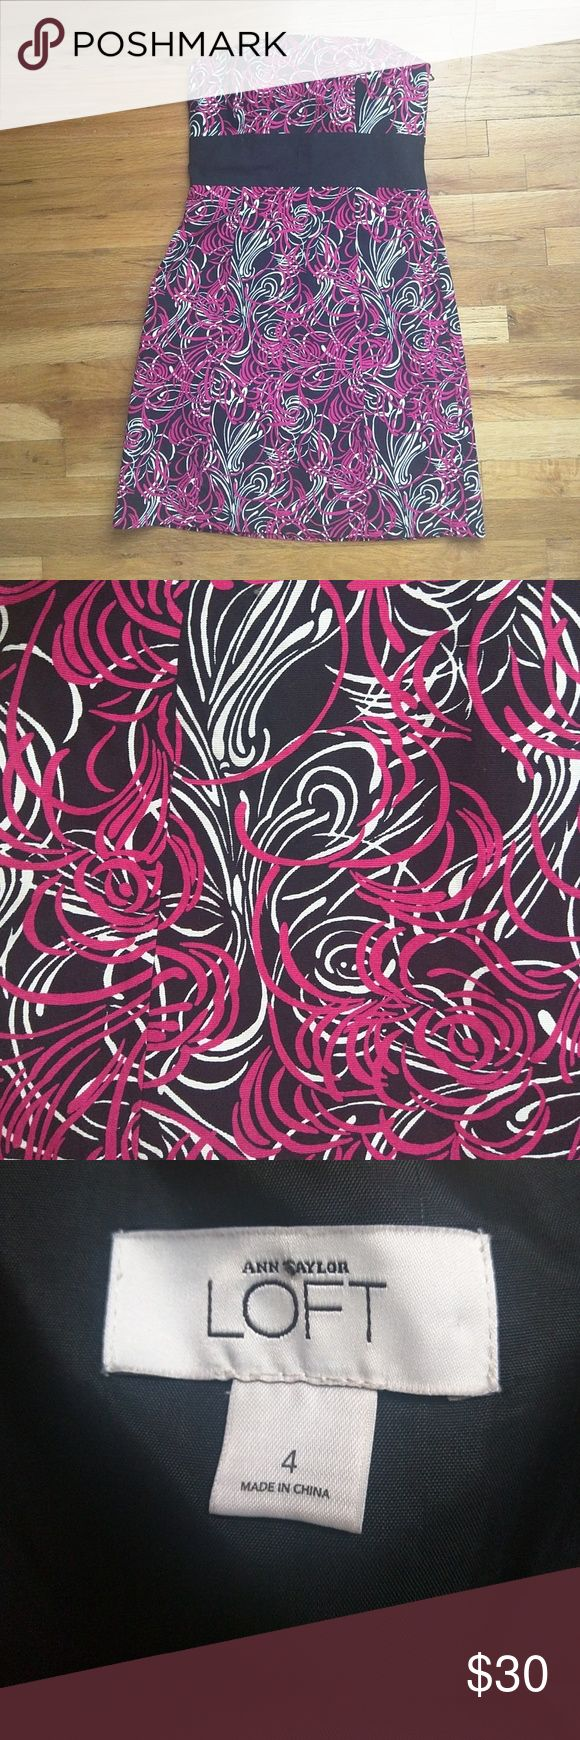 Ann Taylor LOFT Dress Size 4 Strapless Pink and black, excellent condition. Missing belt. LOFT Dresses Mini